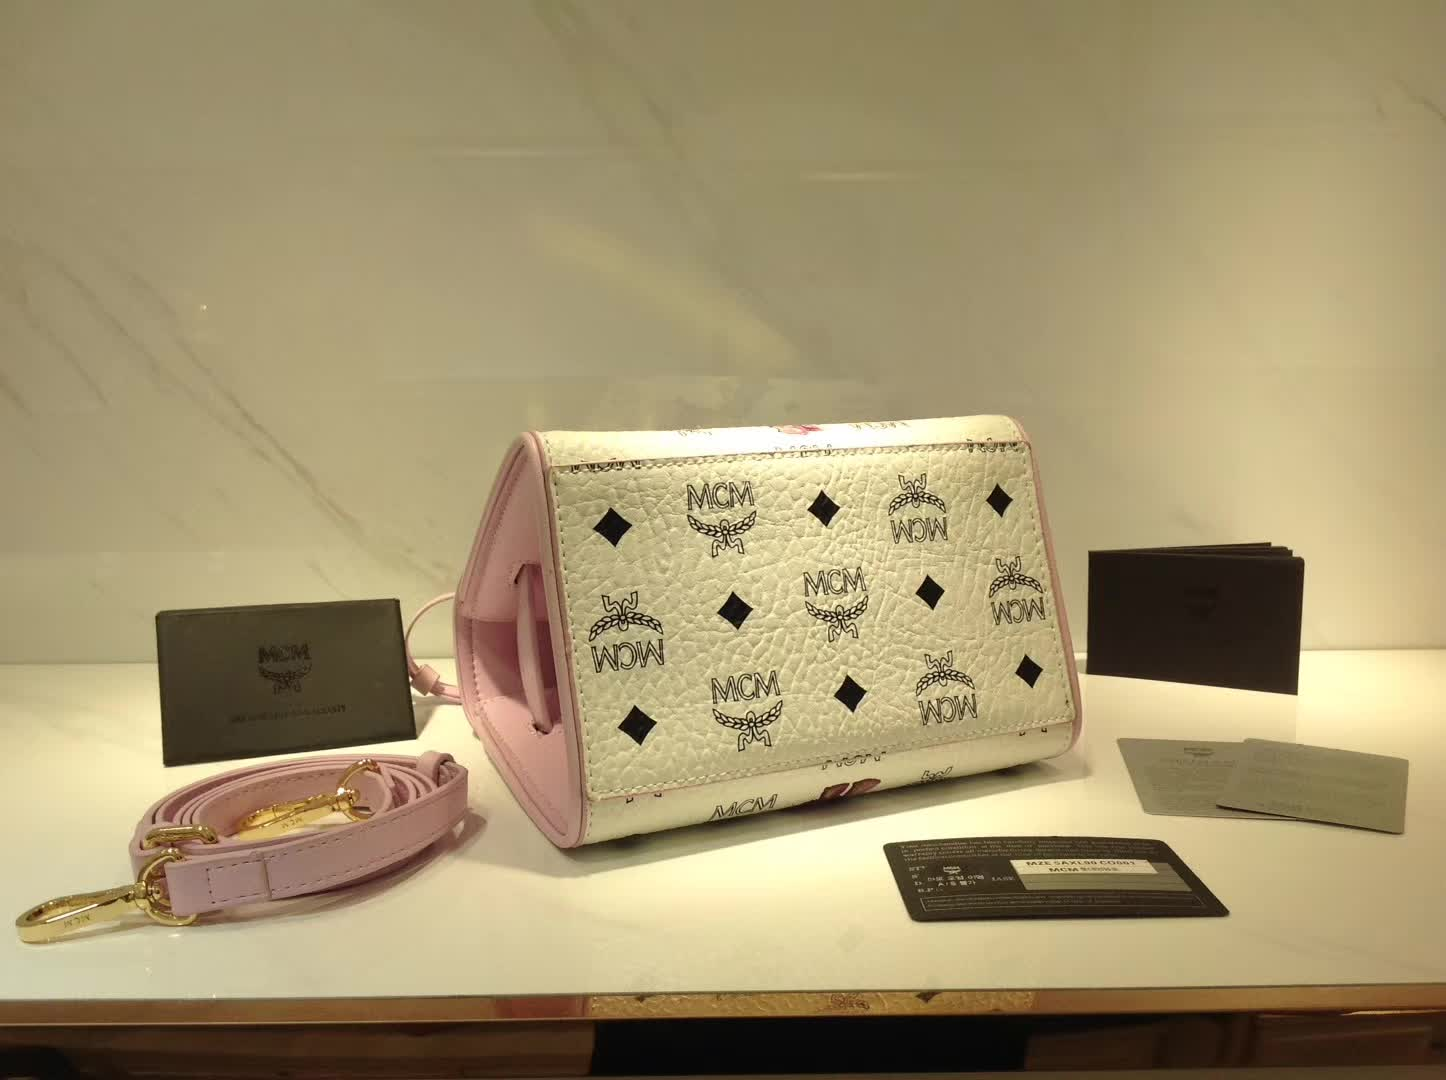 MCM17最新款 HERITAGE高档经典手工制作系列兔子mini kelly 铜牌经典款 白拼粉